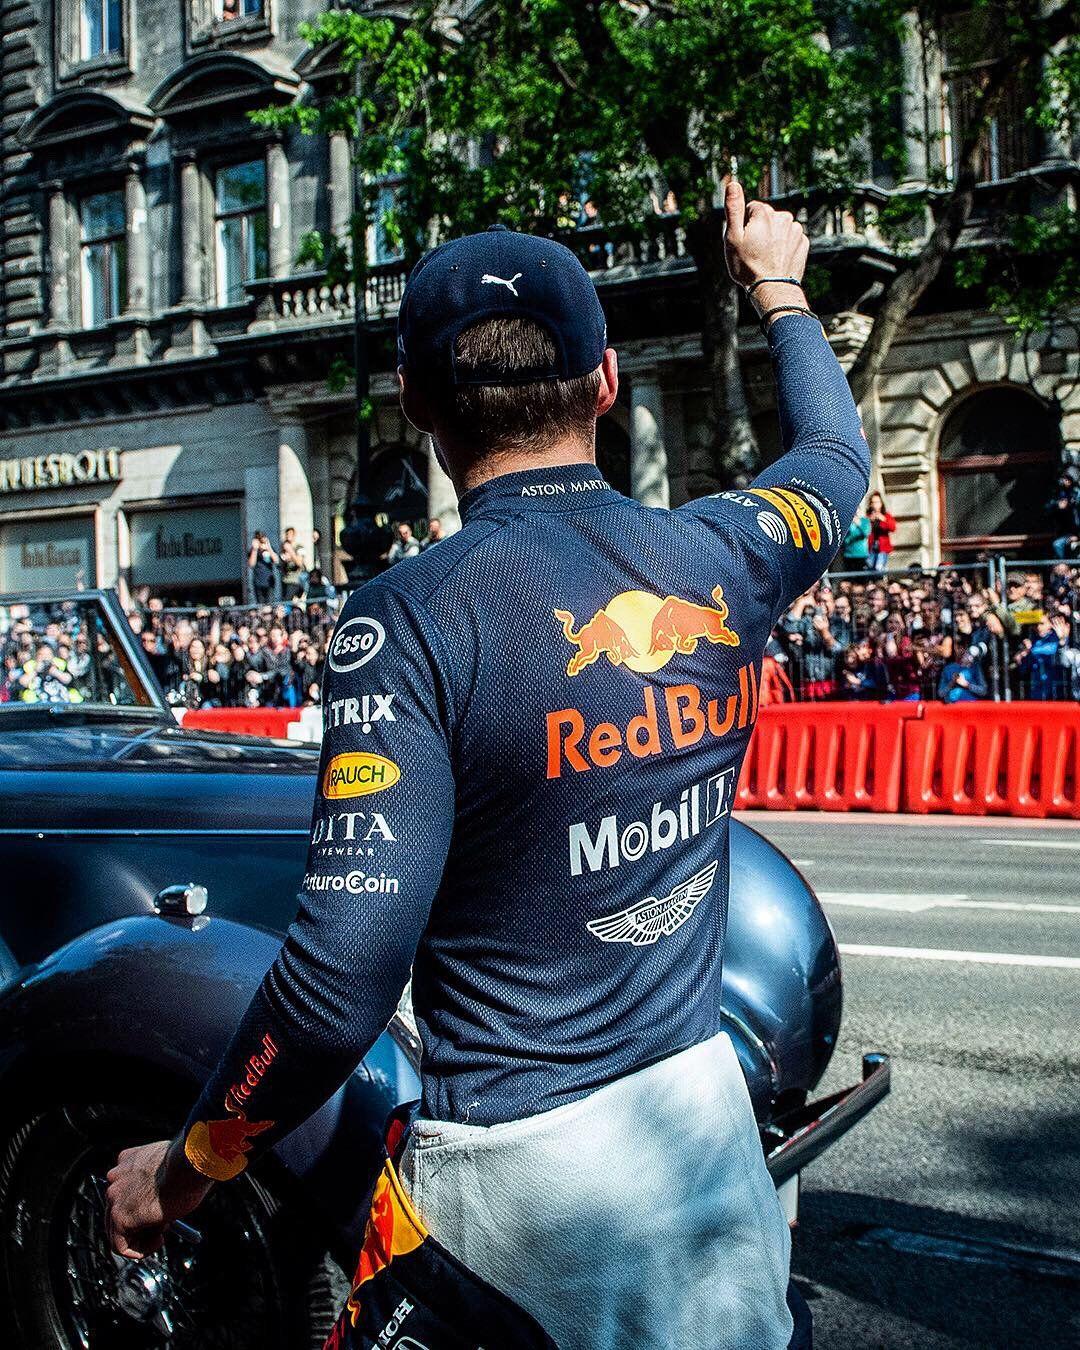 Aston Martin Red Bull Racing On